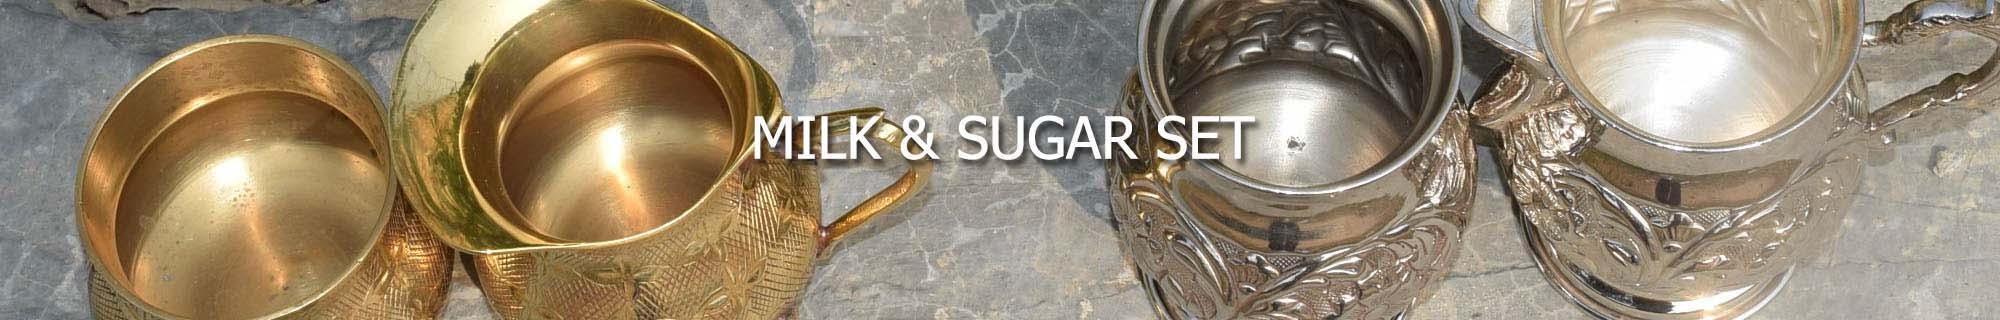 Milk and Sugar Set